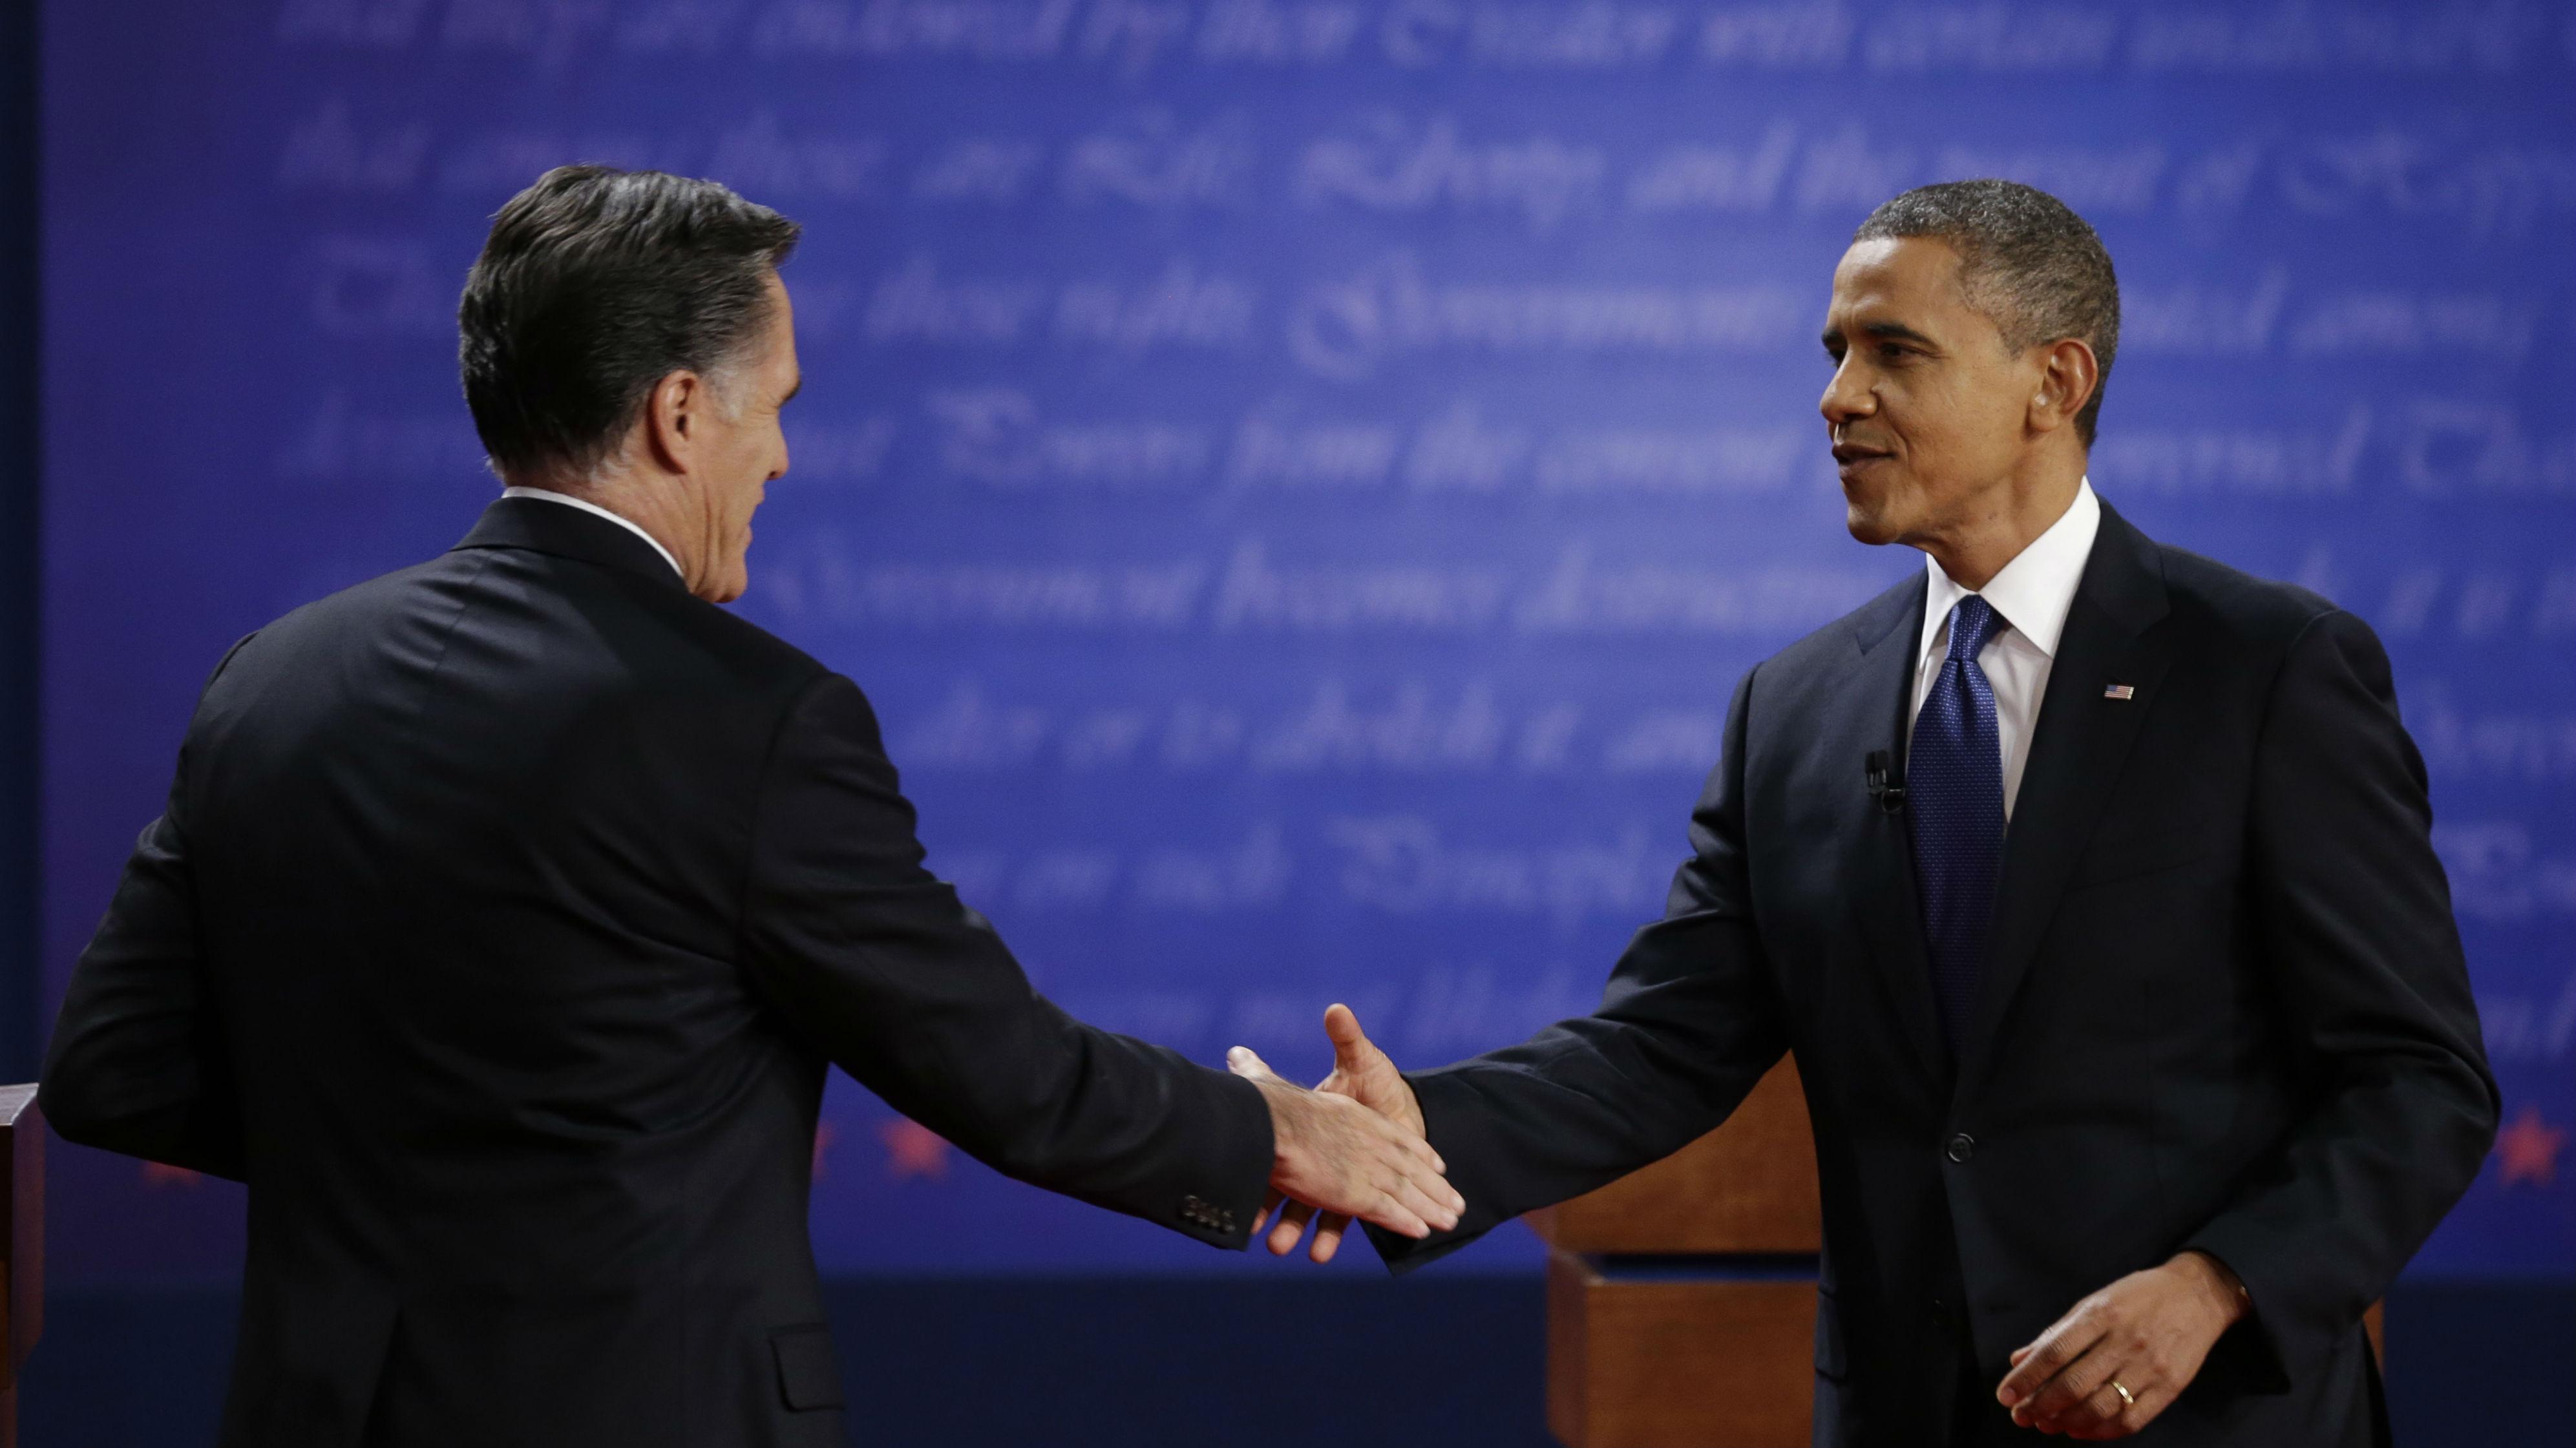 Obama Romney web